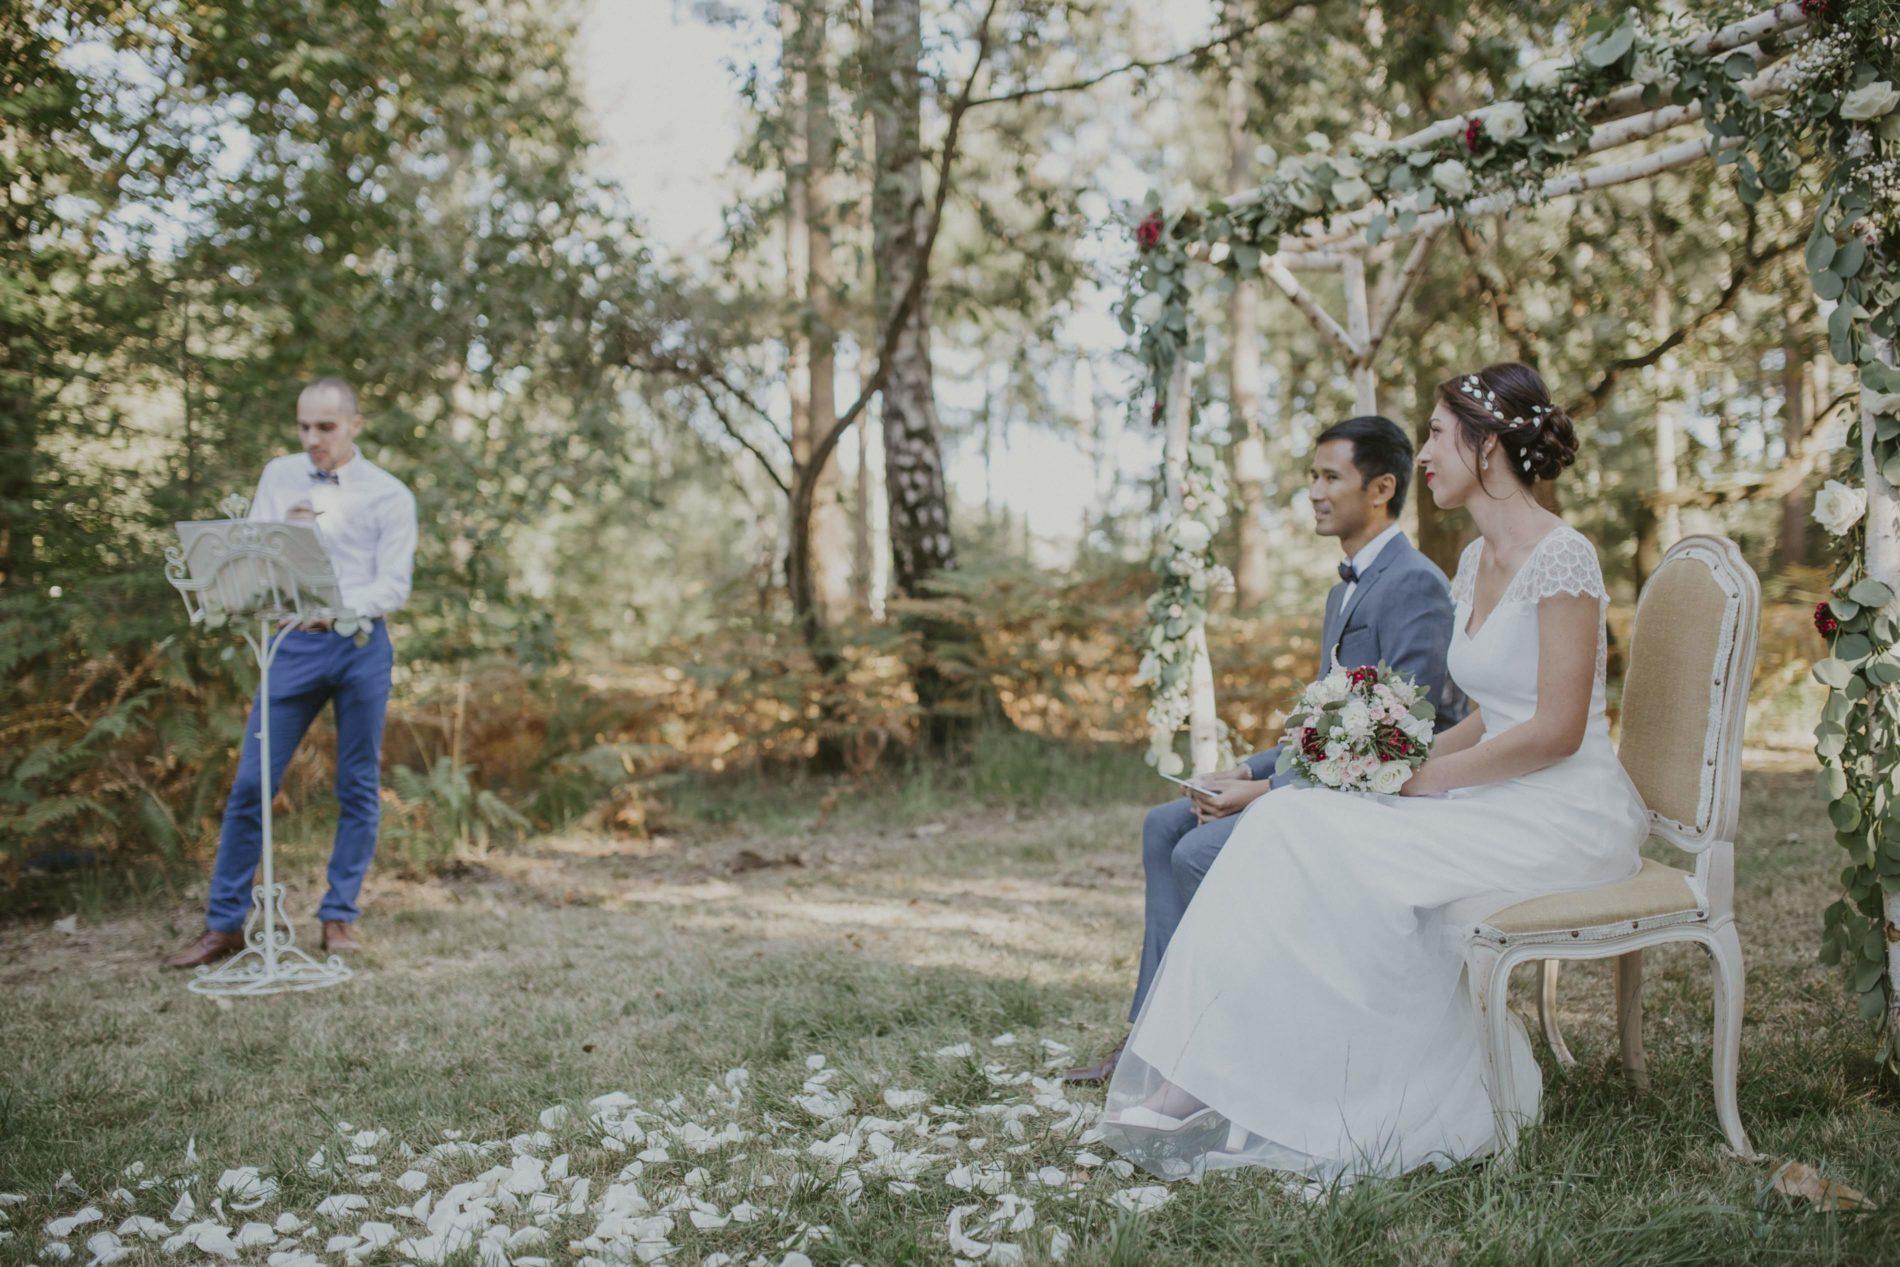 0166_03-CelineSereivuth-166-obonheurdesdames-decoration-mariage-location-Jordane-Chaillou